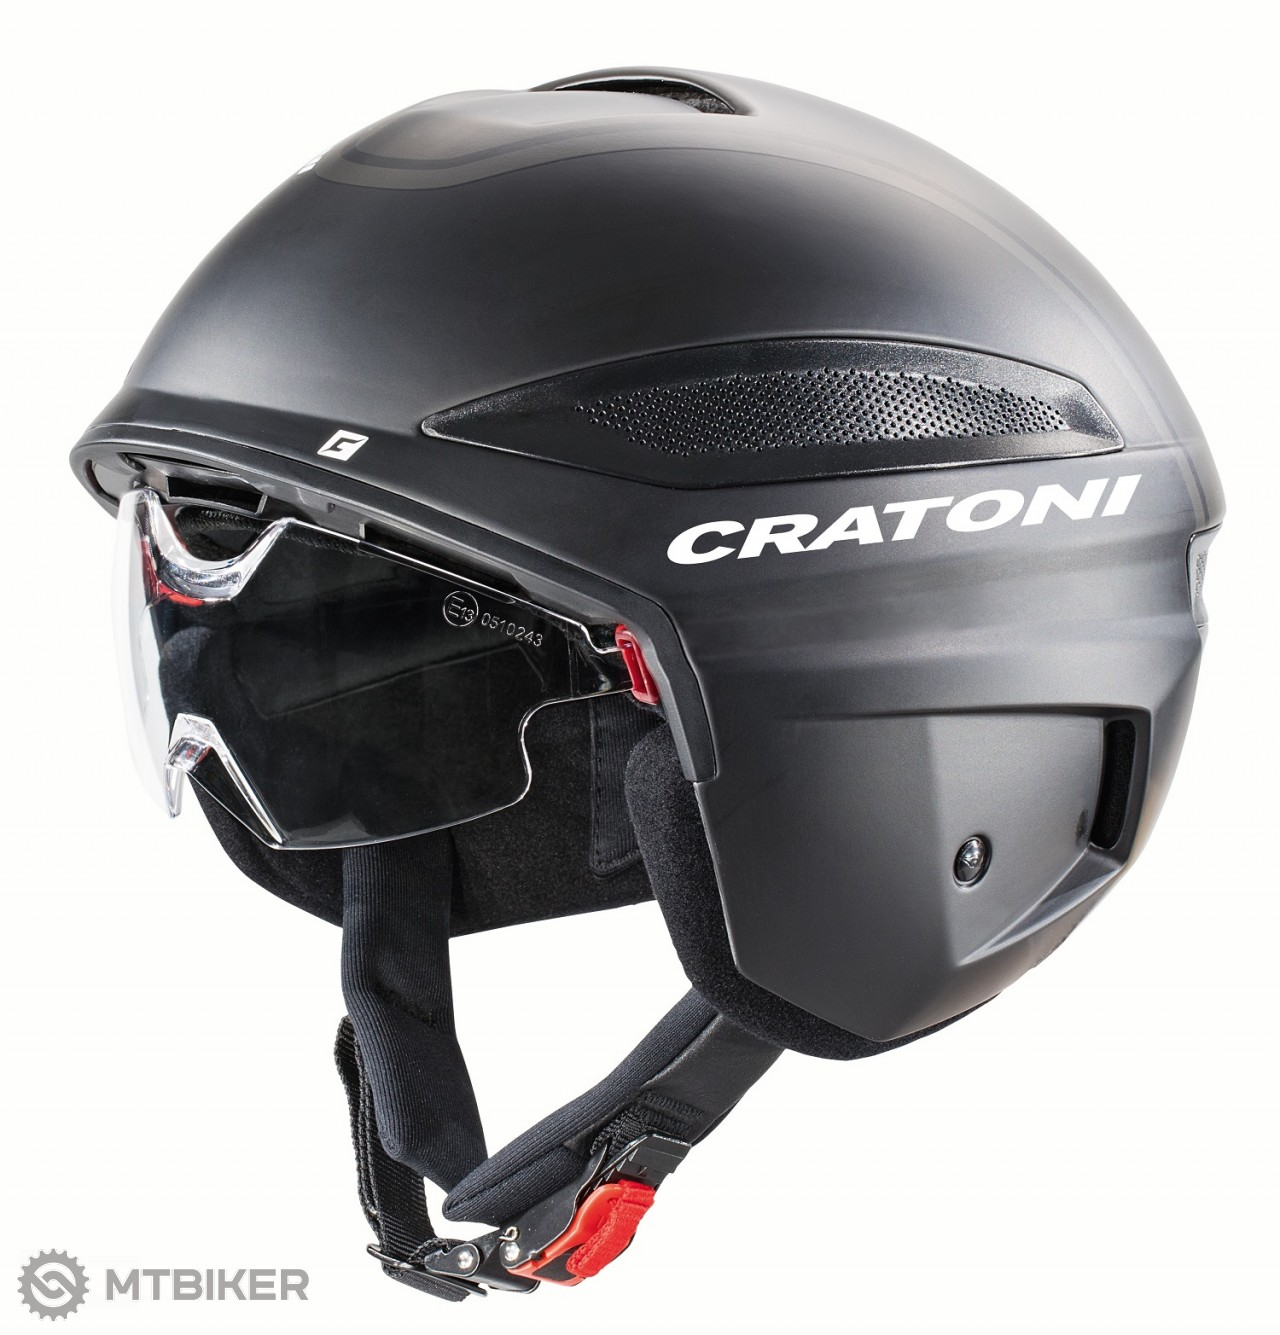 Cratoni VIGOR - black-black matt, e-bike/moto, model 2021